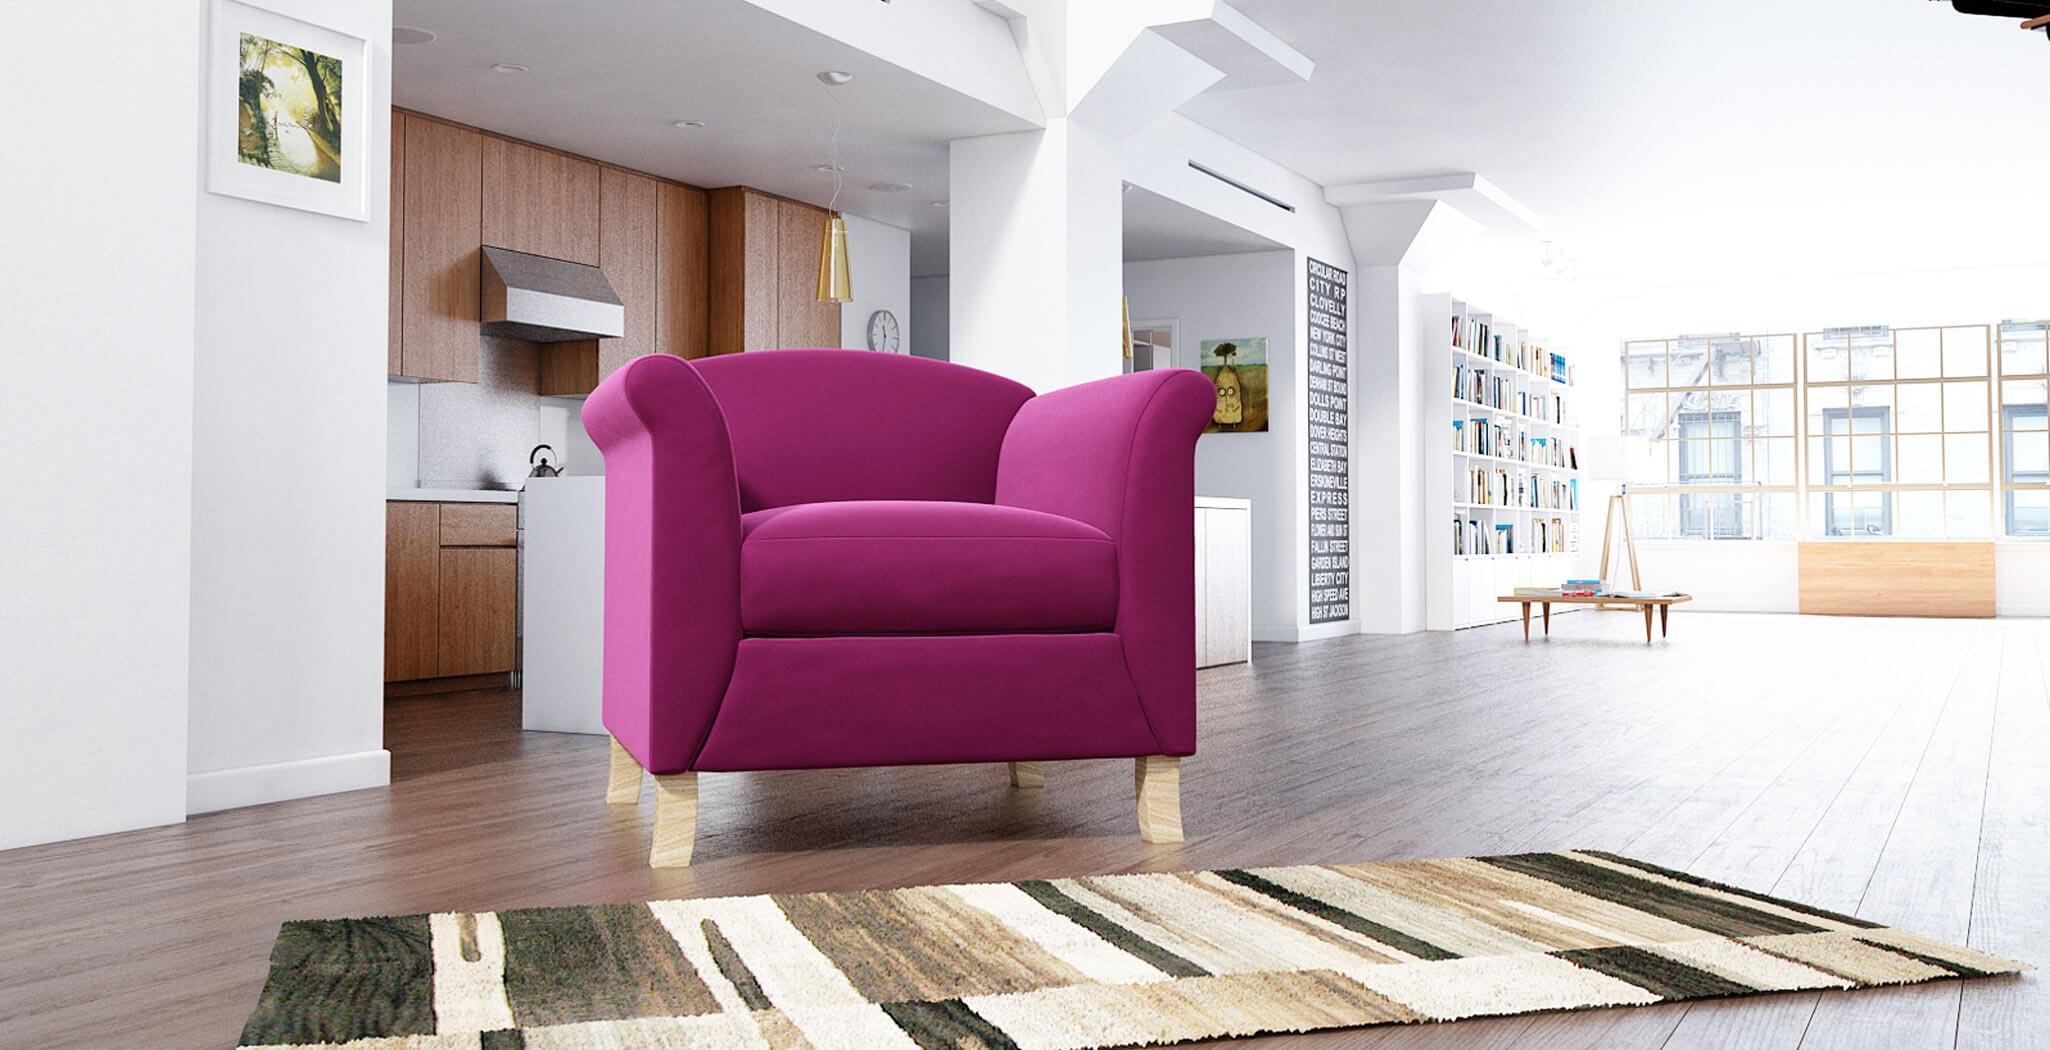 crete chair furniture gallery 3